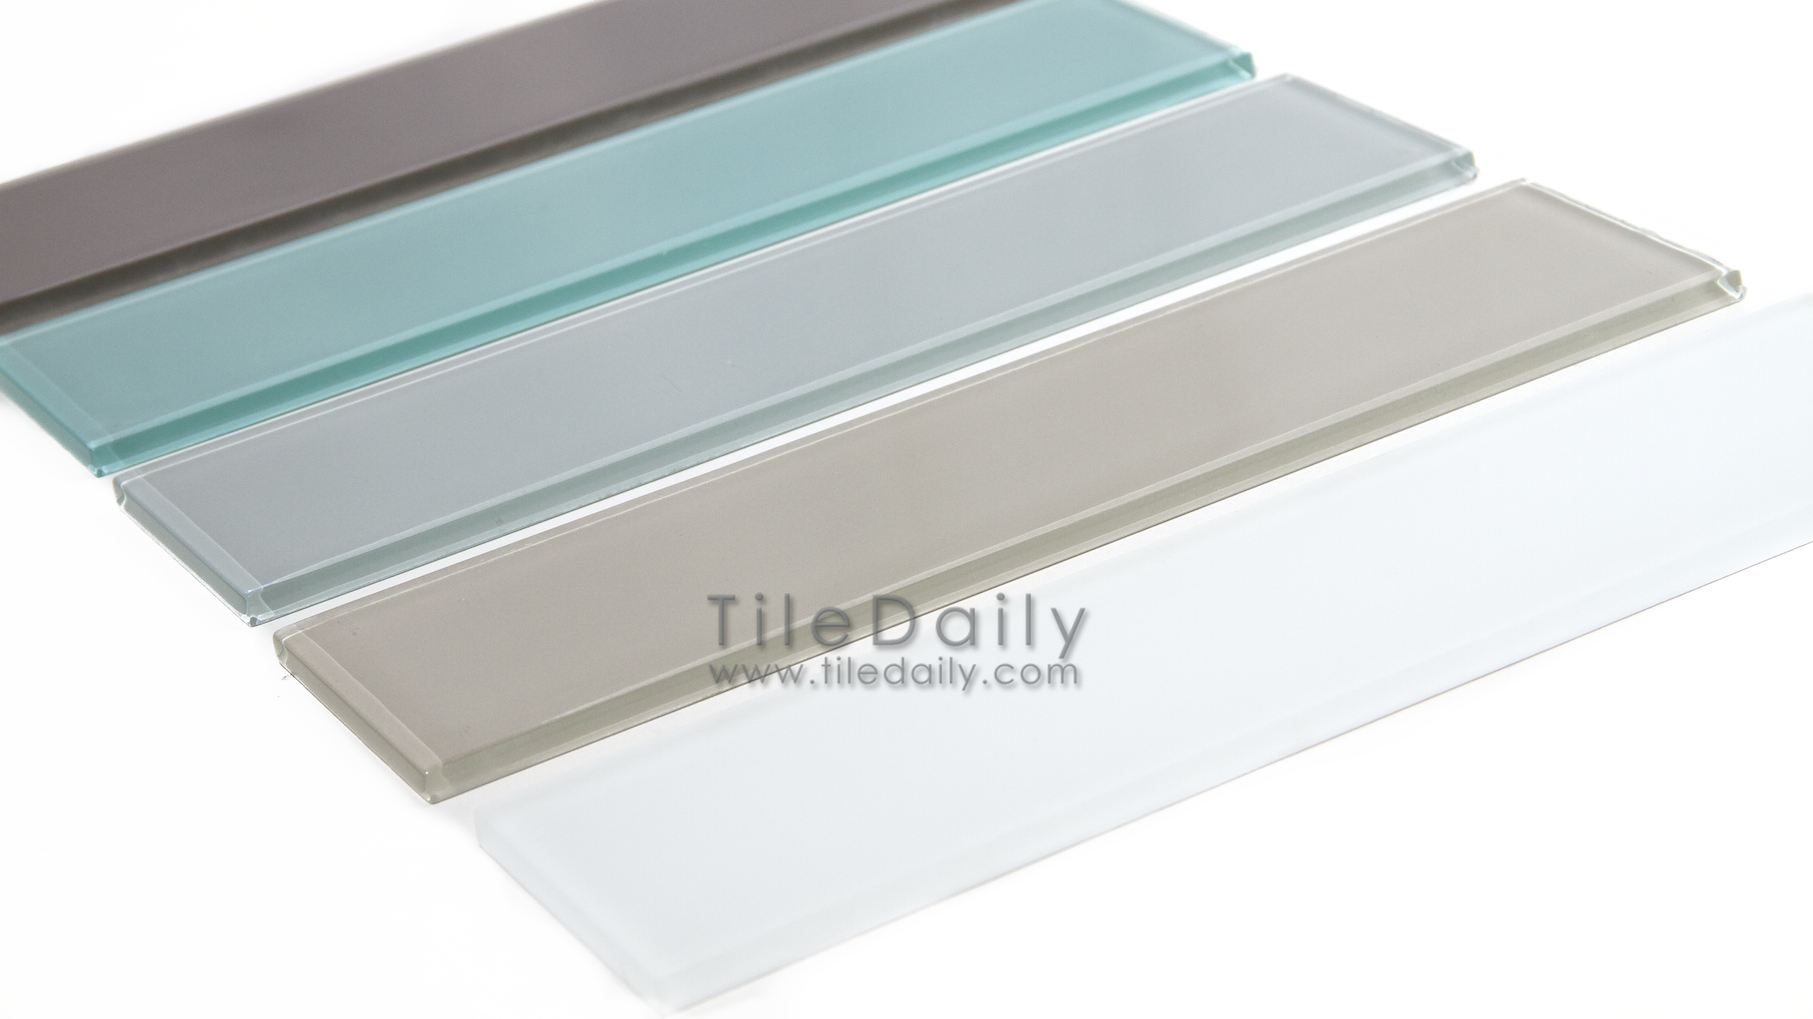 Slim Glass Subway Tile 5 Colors Tiledaily